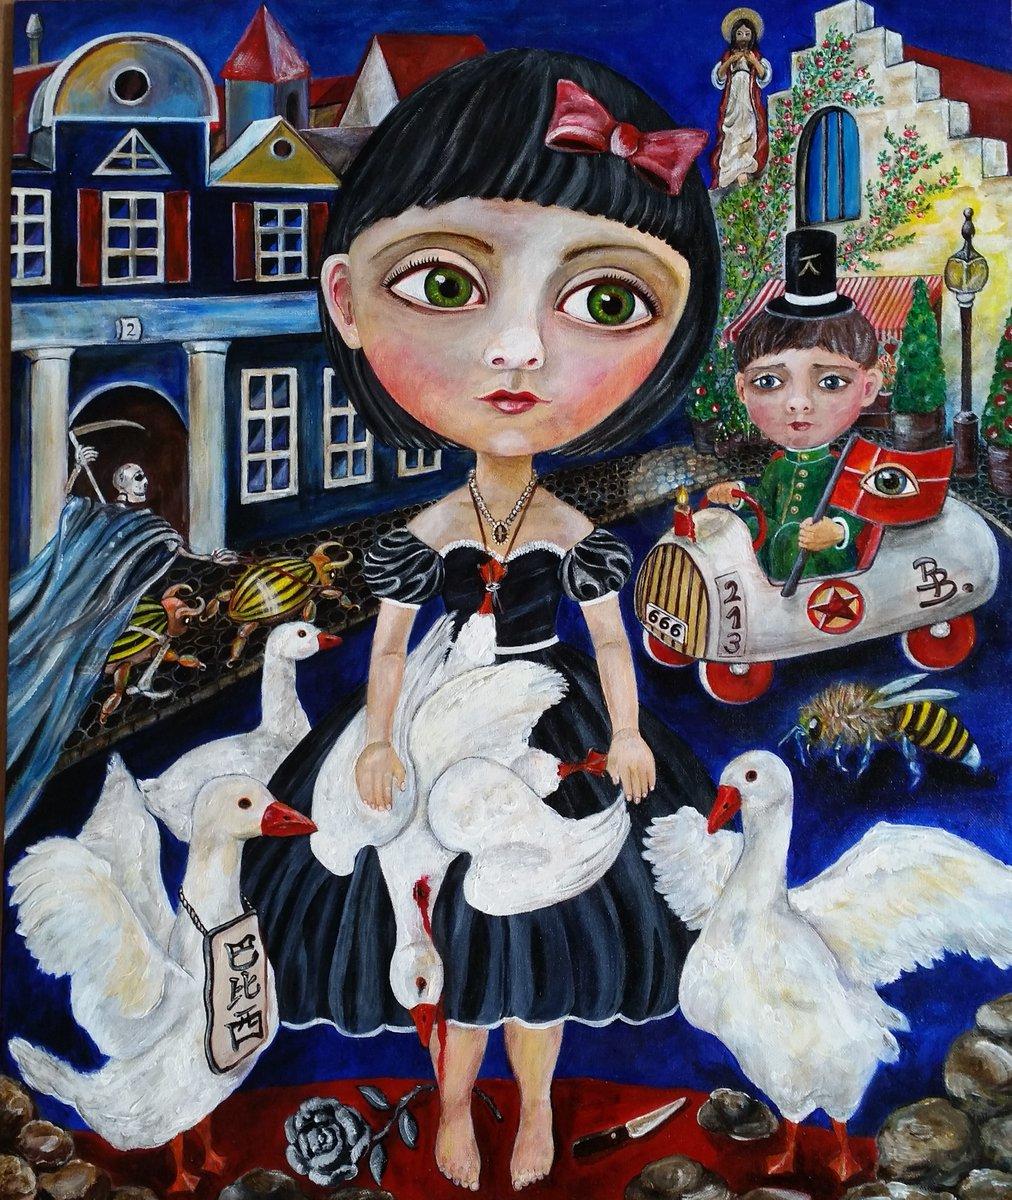 #Black_Rose #Painting #Surrealism #Acrylic #Canvaspanel #BarbaraBillei...